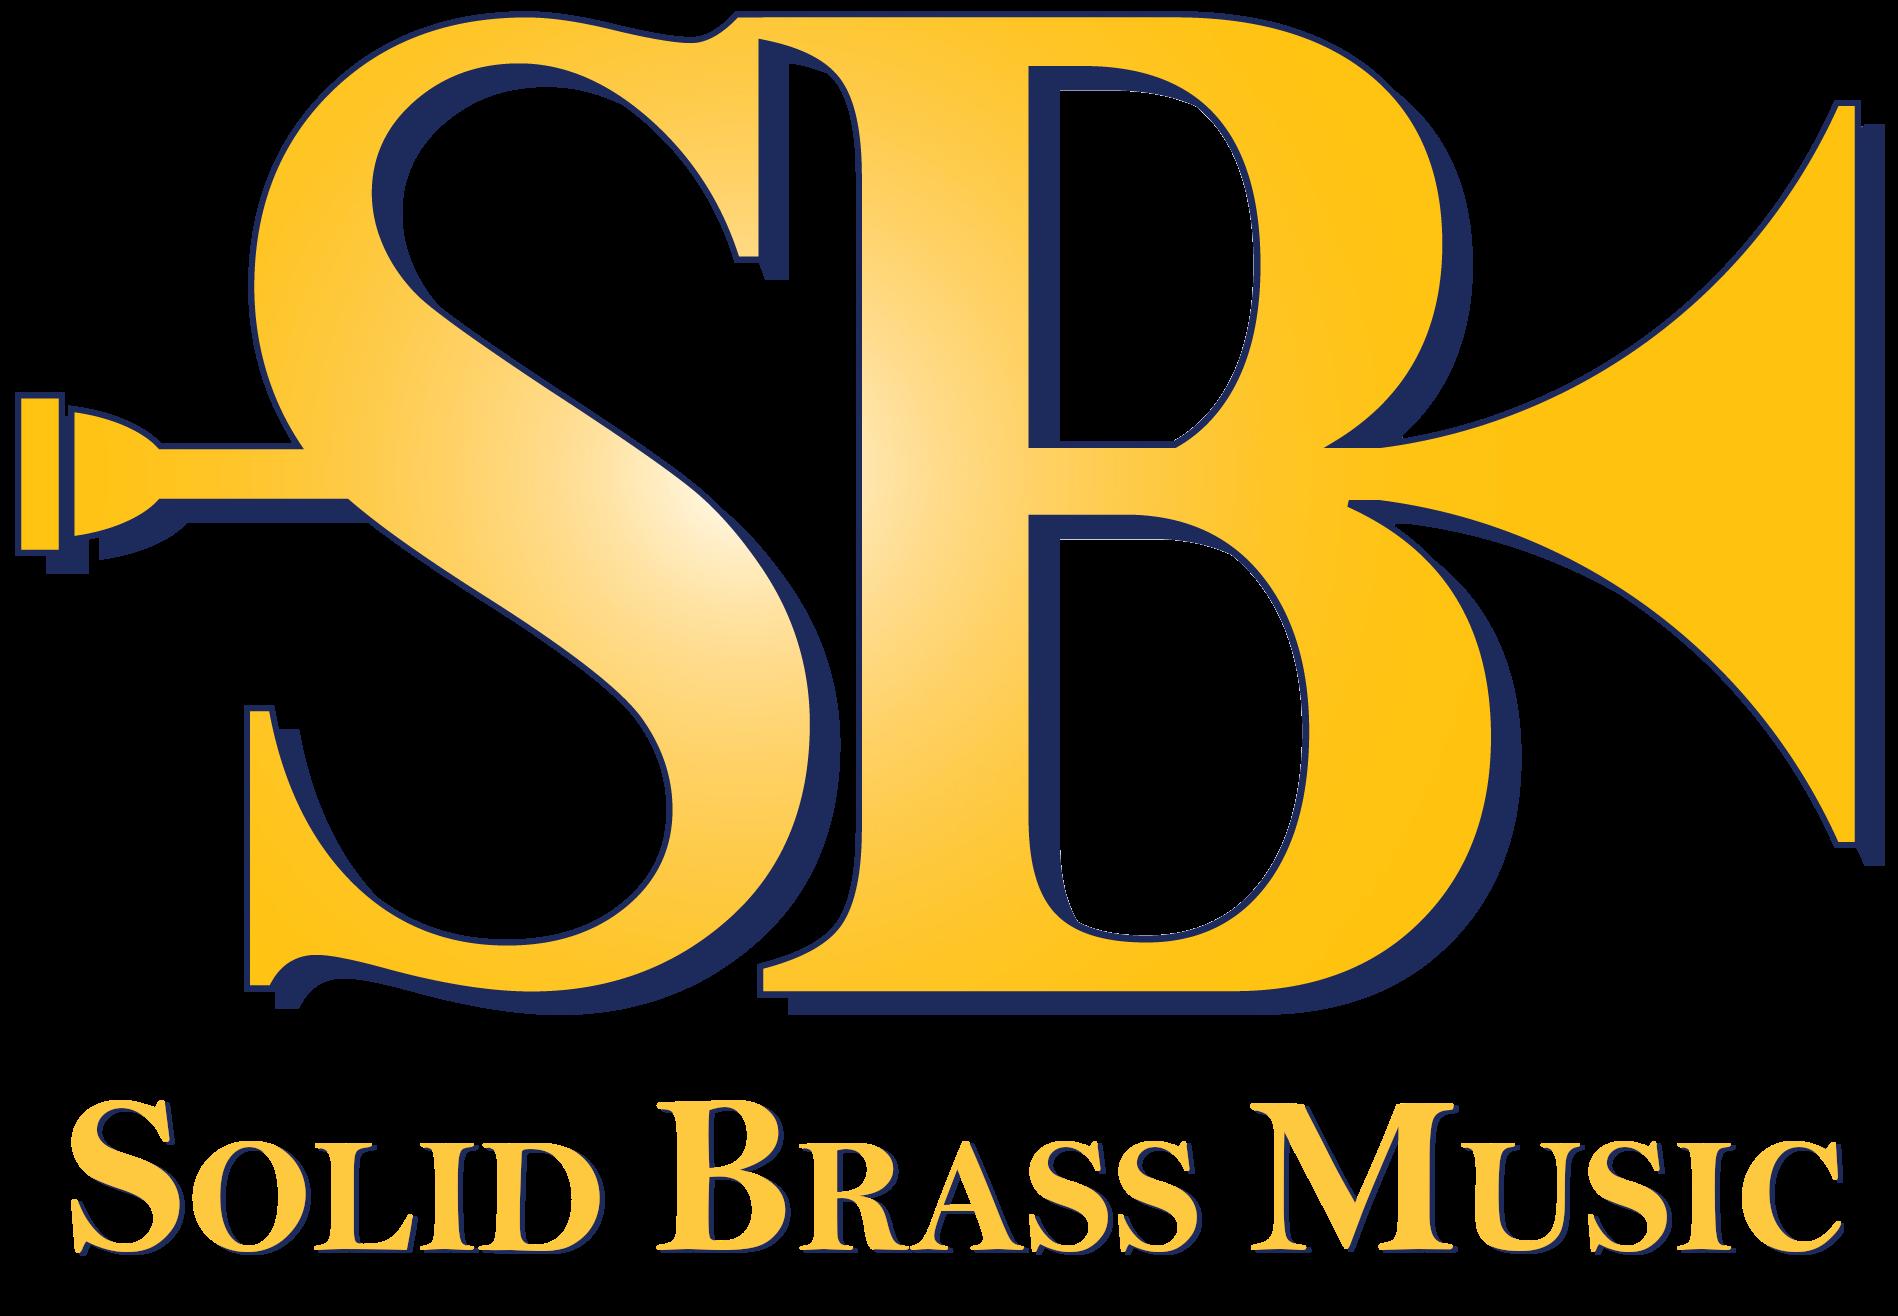 Solid Brass Music